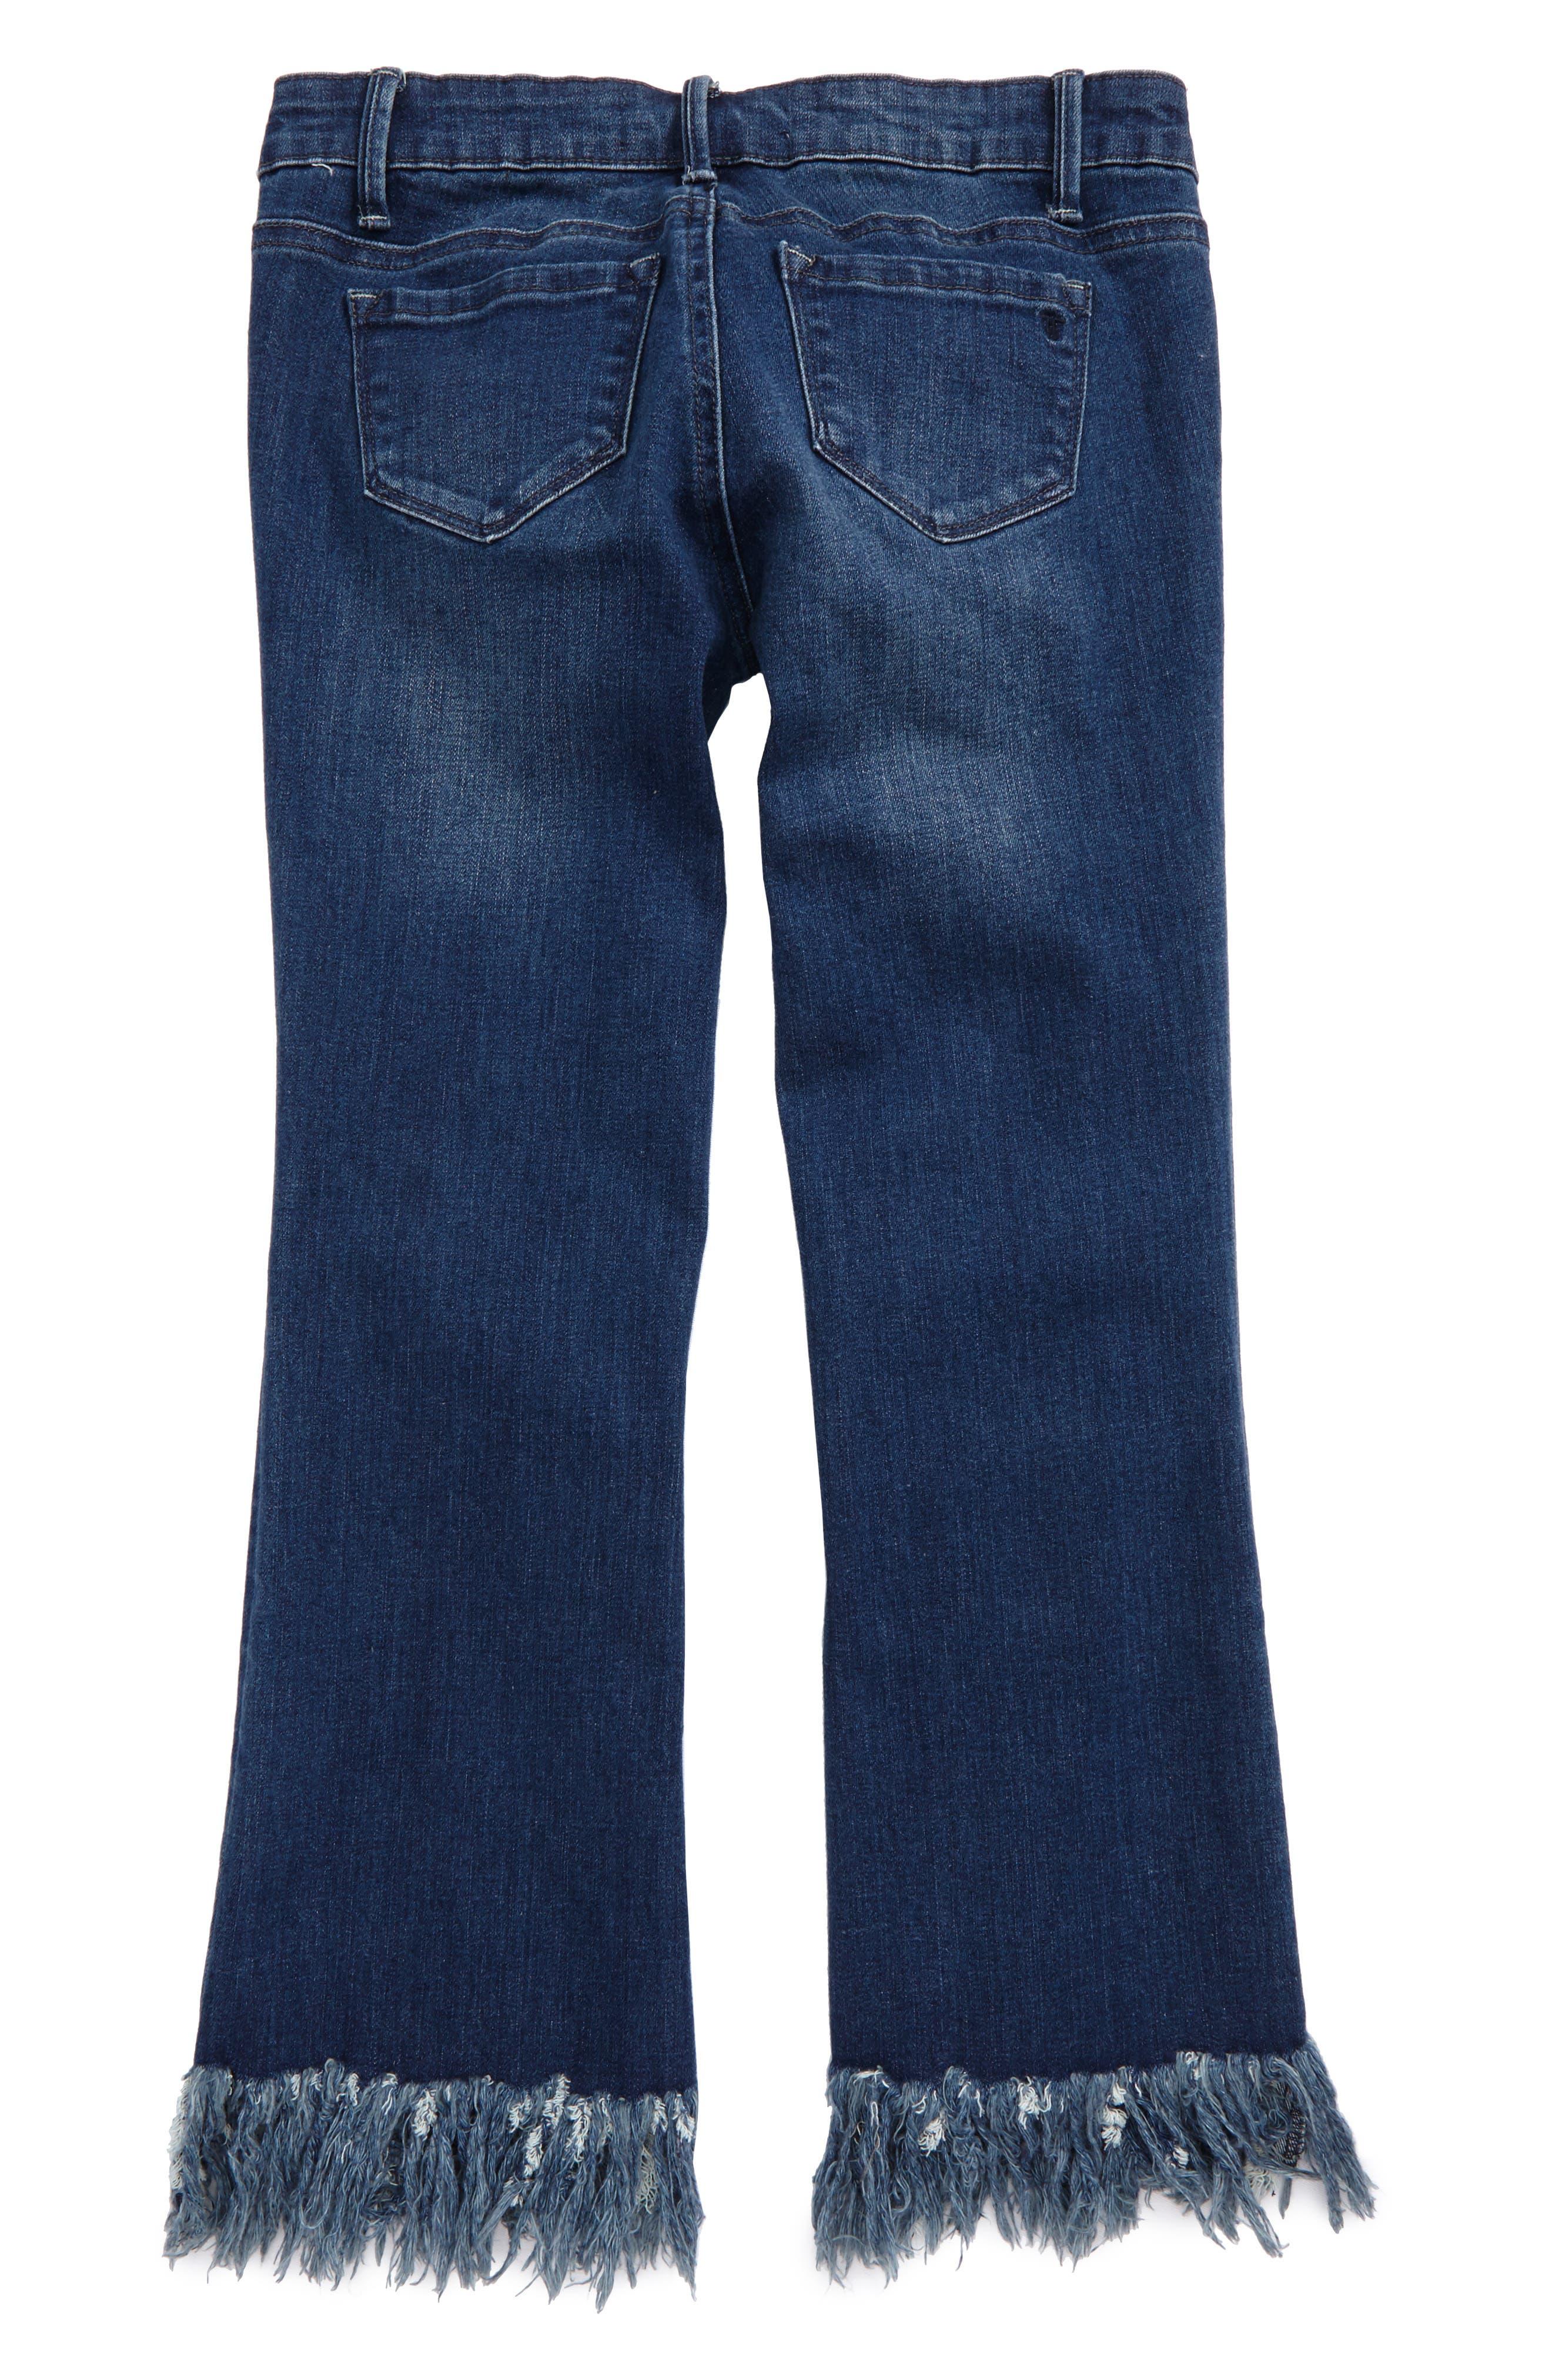 Alternate Image 2  - Tractr Frayed Hem Crop Jeans (Big Girls)